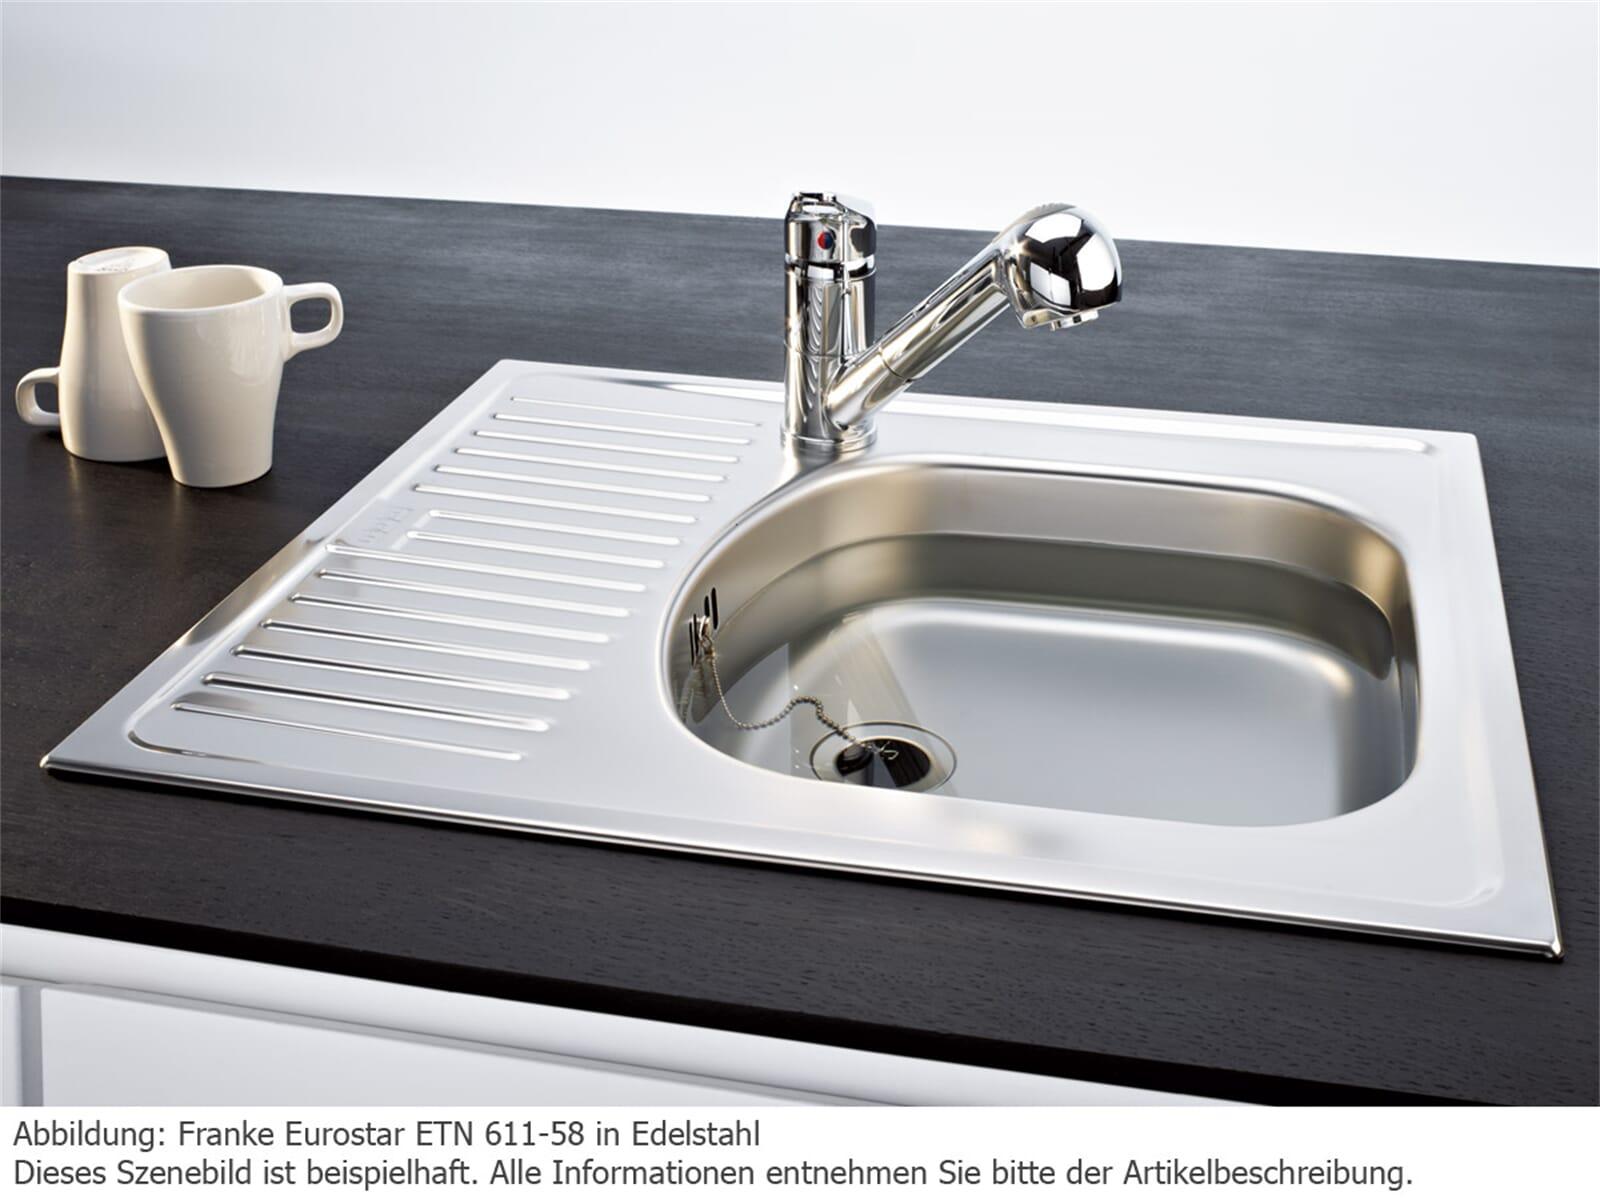 Franke Eurostar ETN 611-58 Edelstahlspüle seidenmatt (ohne Ablaufgarnitur) - 101.0009.358